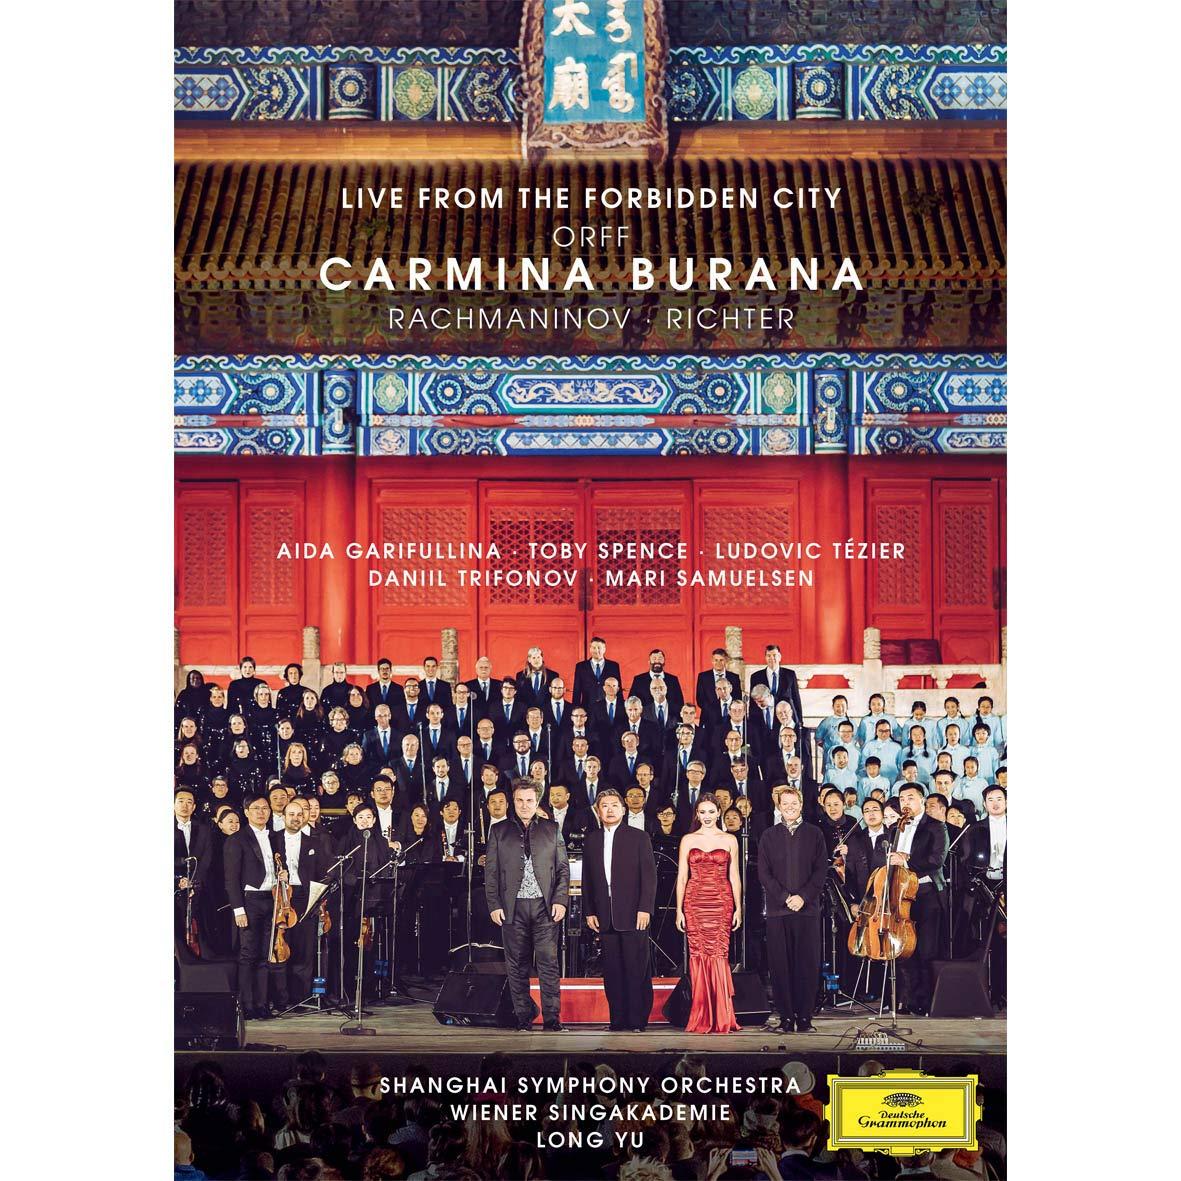 TRIFONOV - CARMINA BURANA (DVD)